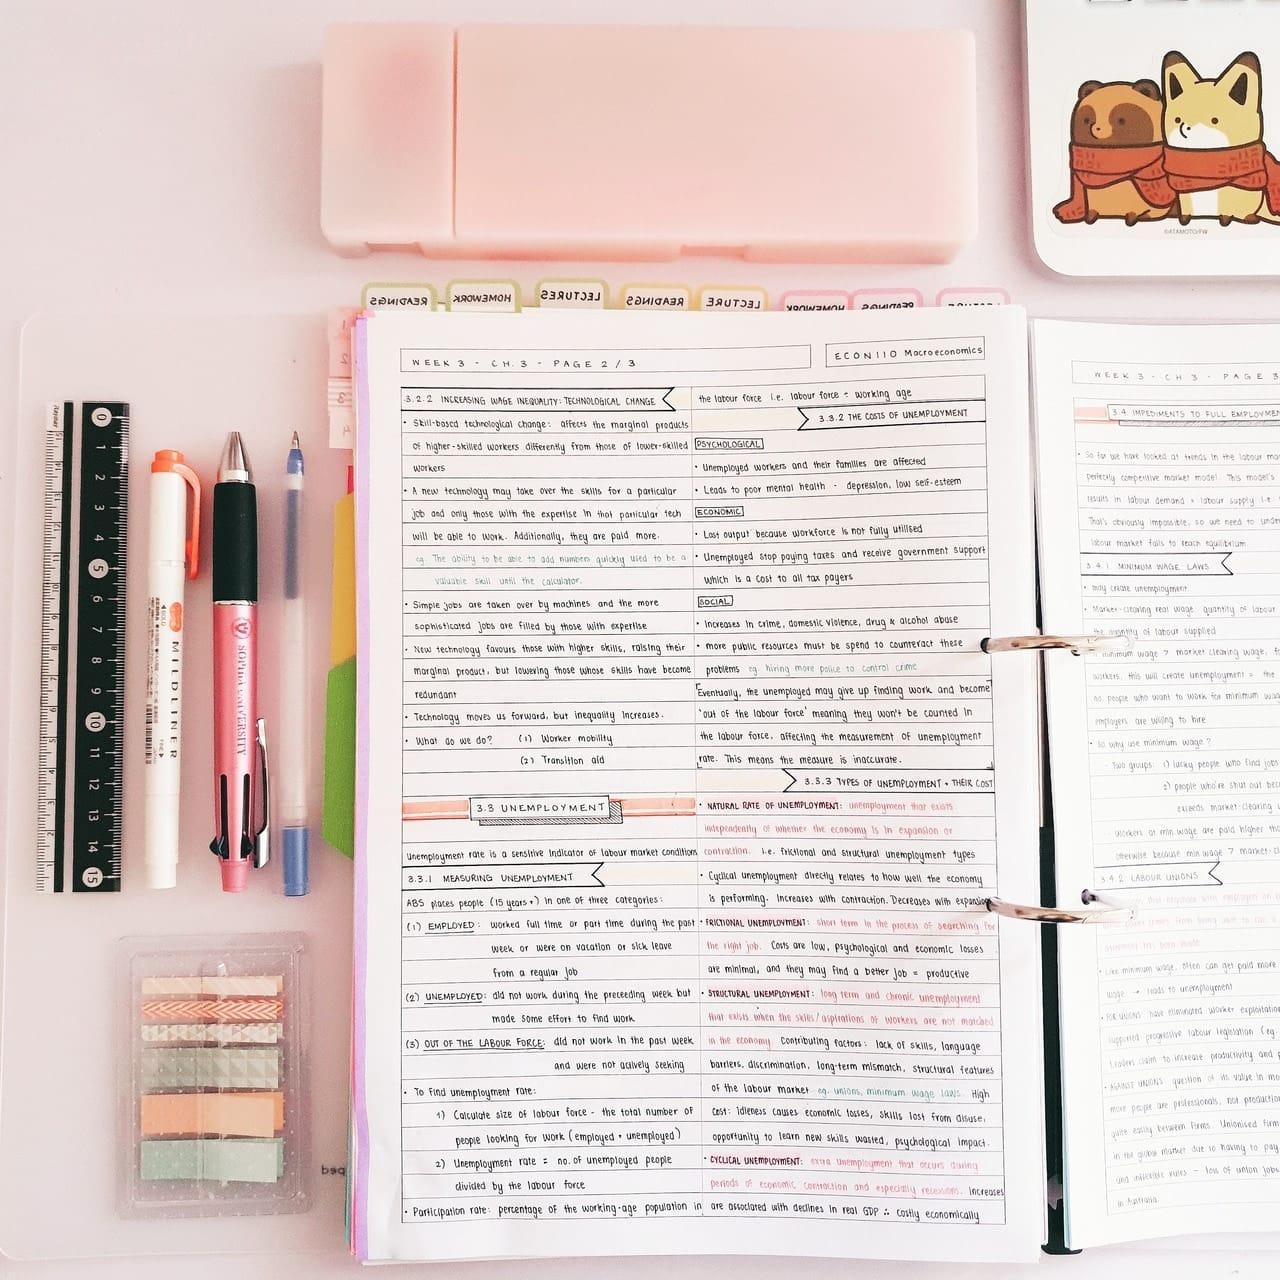 studyblr | Tumblr shared by Ignacia on We Heart It